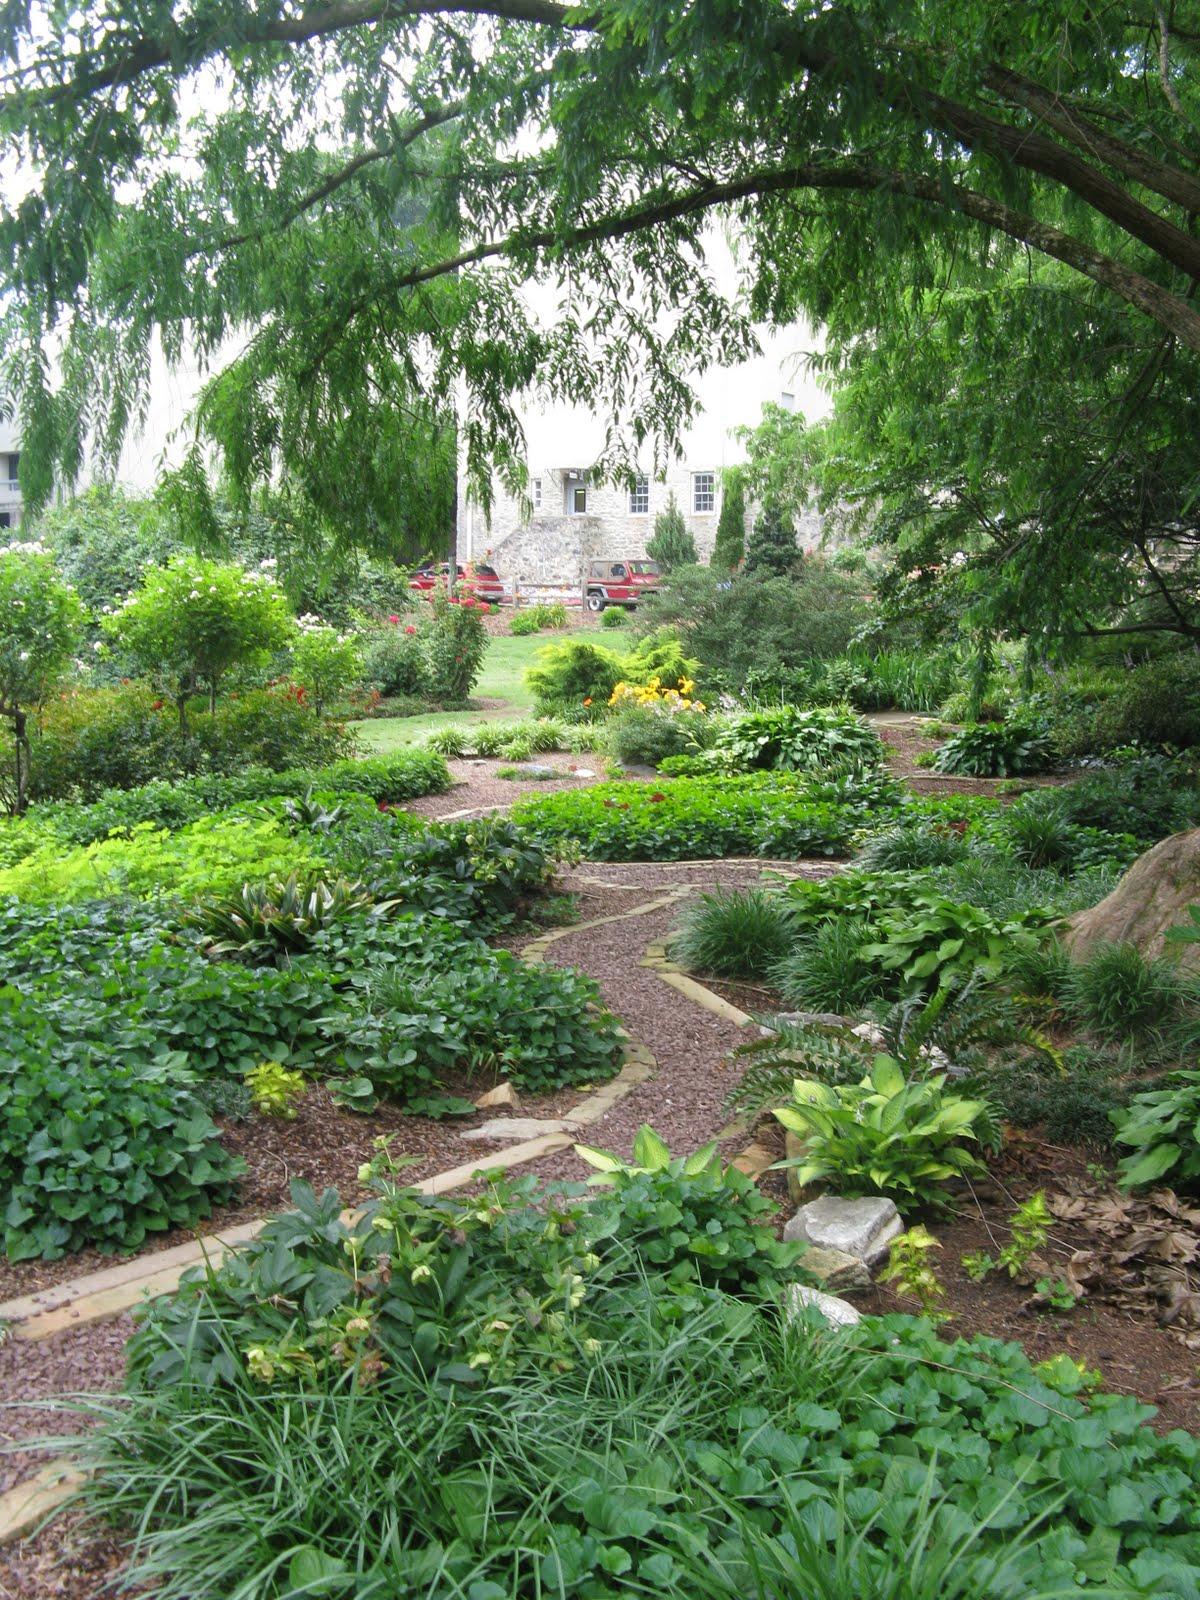 Raleigh art architecture urbanism urban oasis raleigh rose garden for Raleigh little theater rose garden